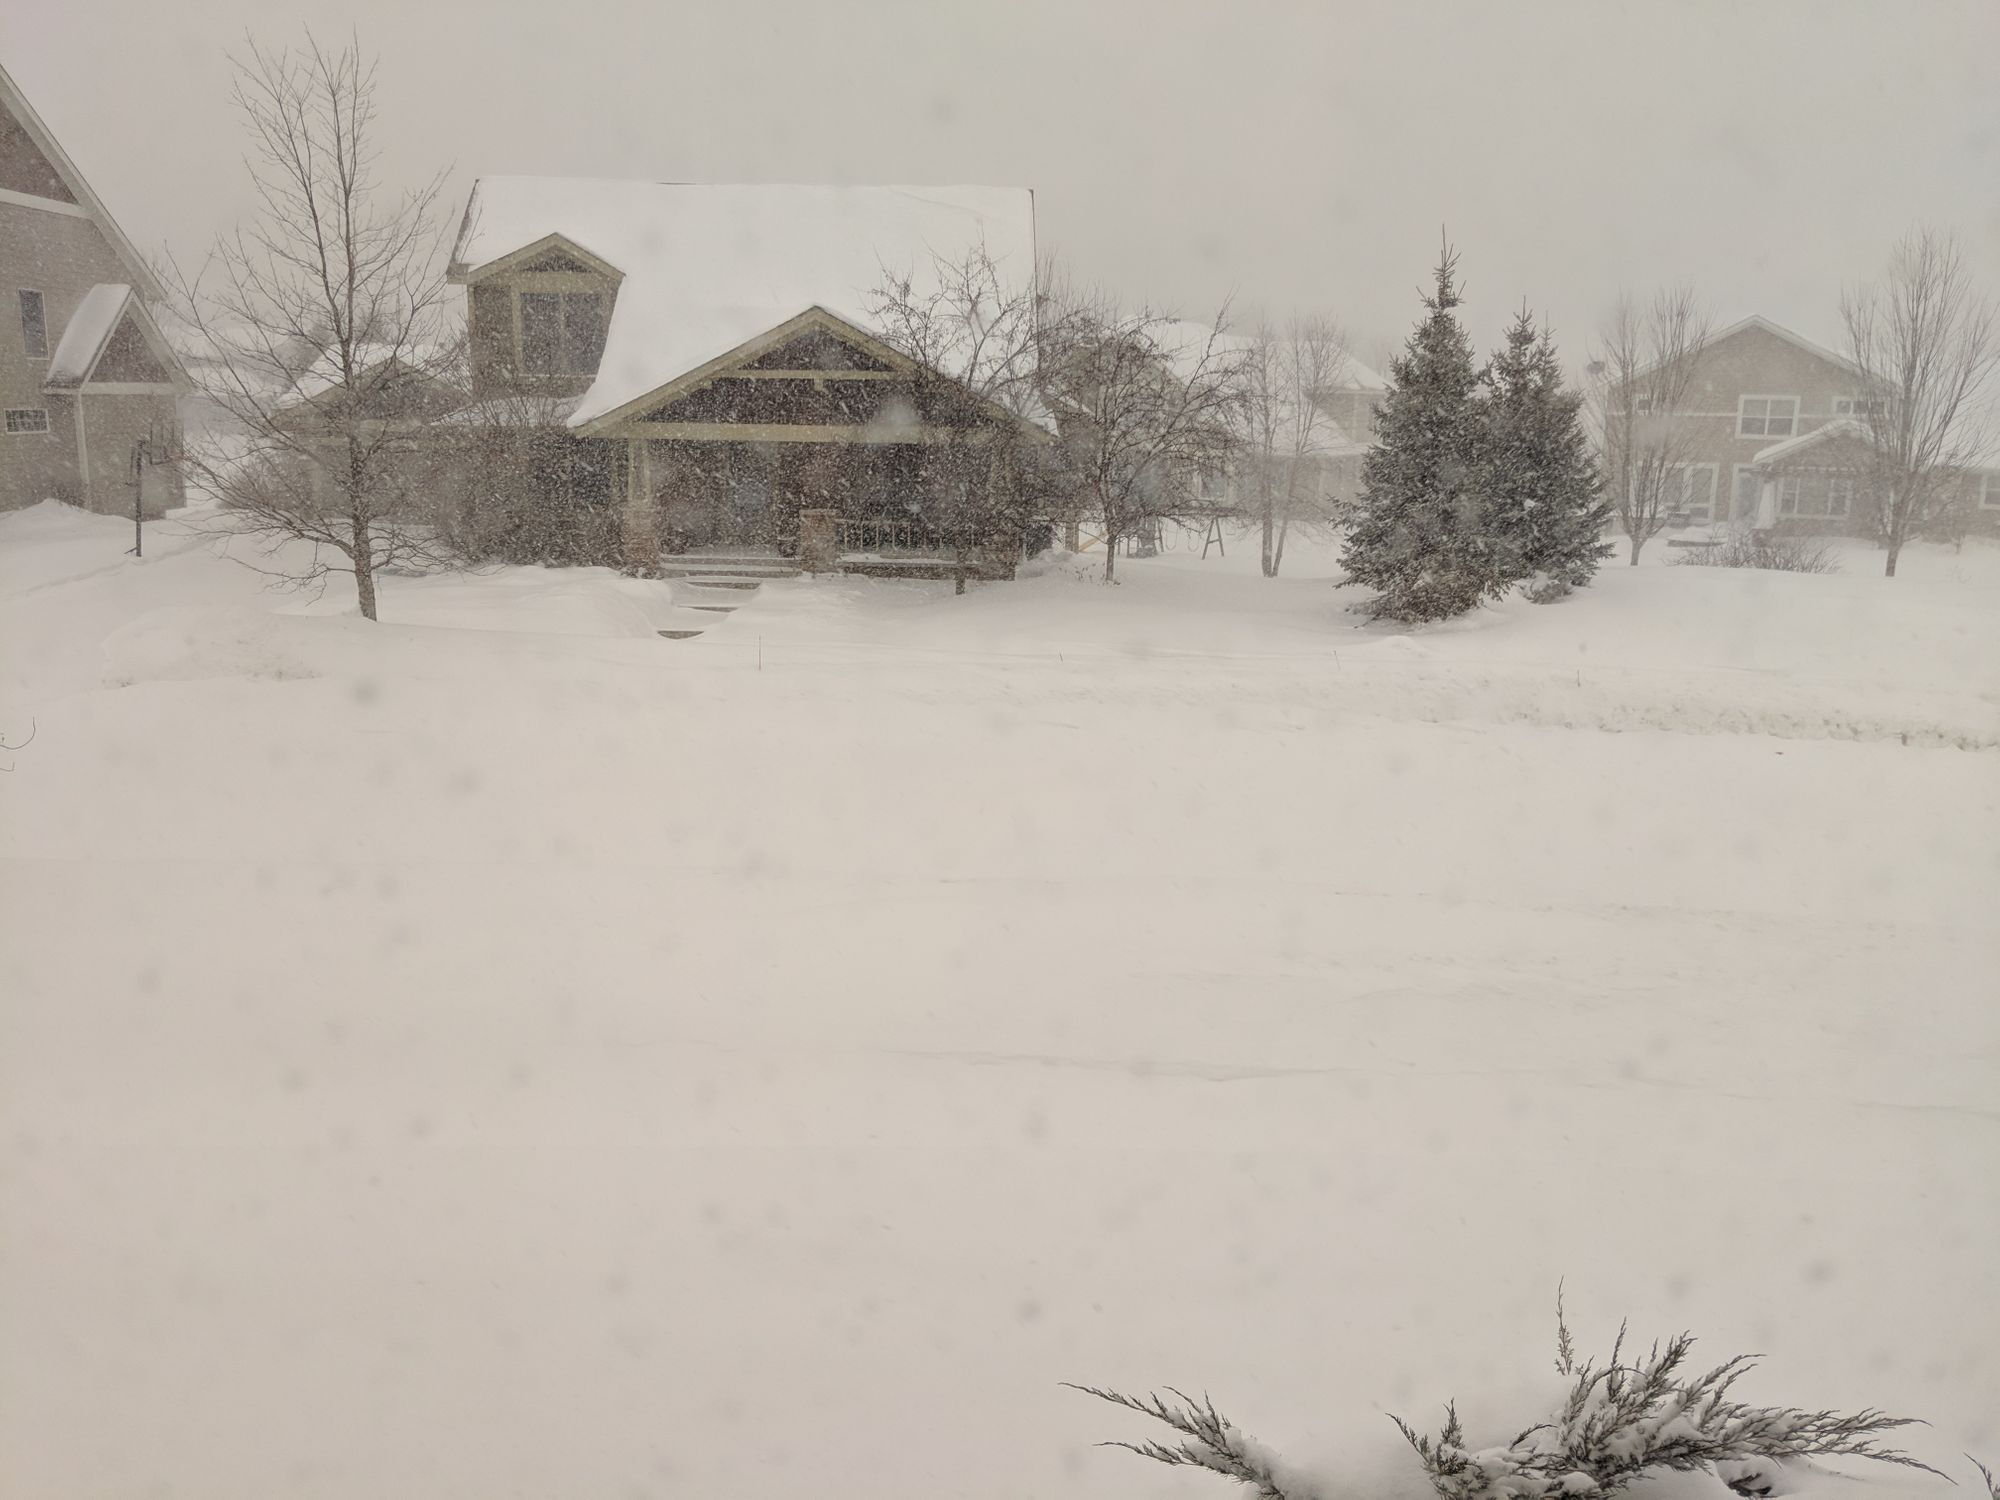 sledding snow day